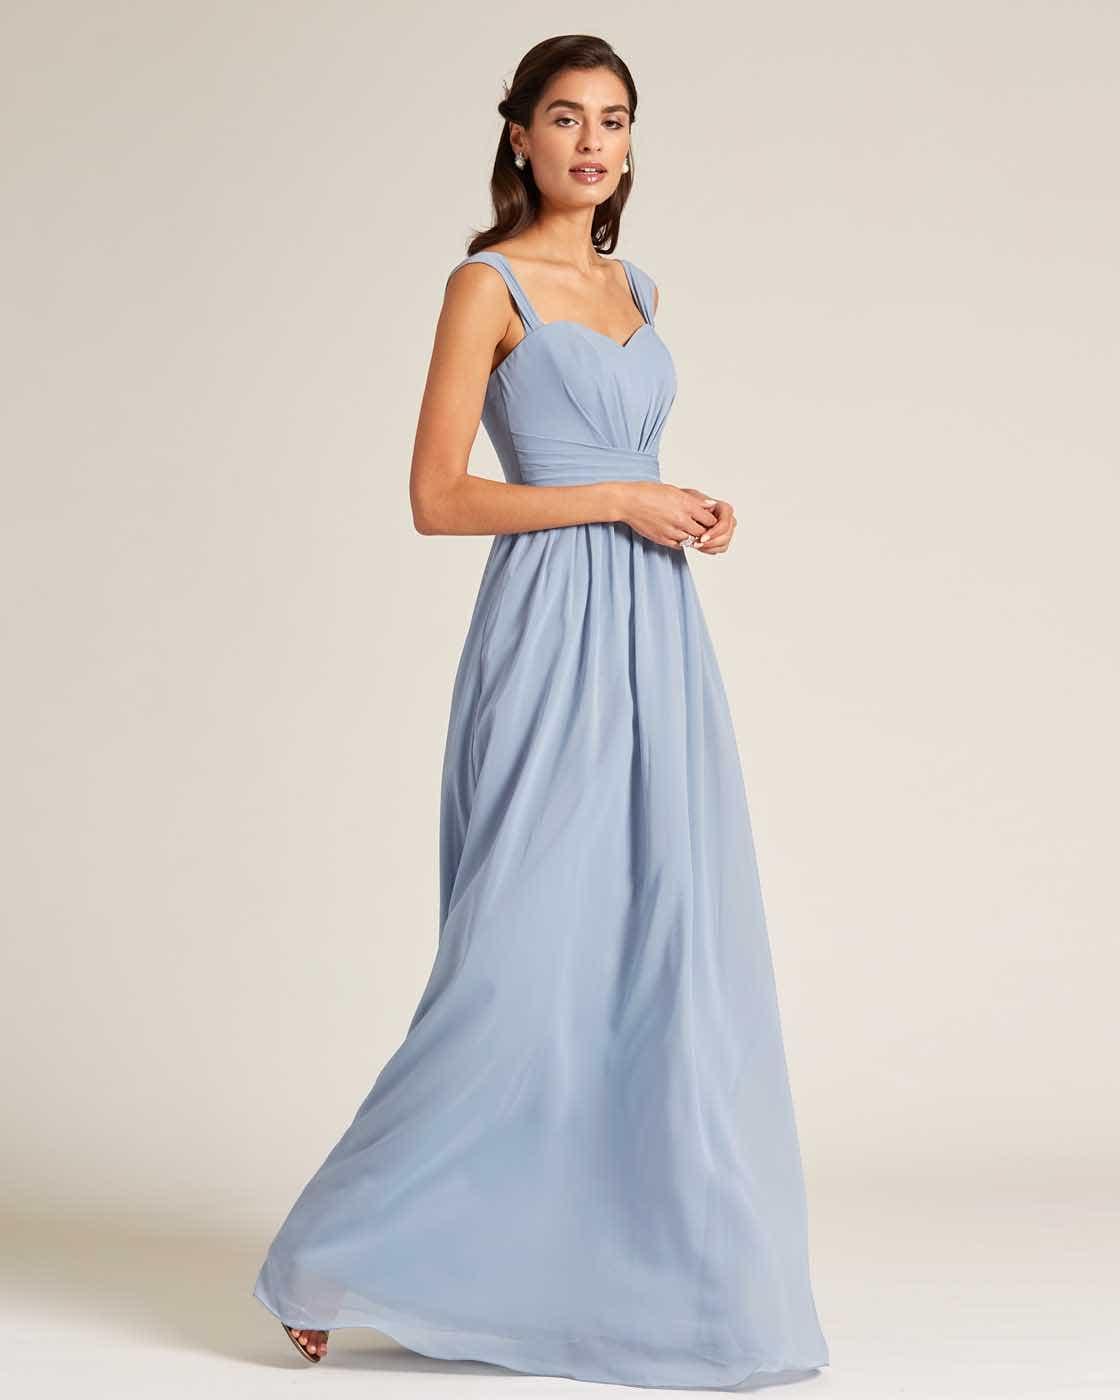 Blue Thick Strap Sweetheart Neckline Dress - Side